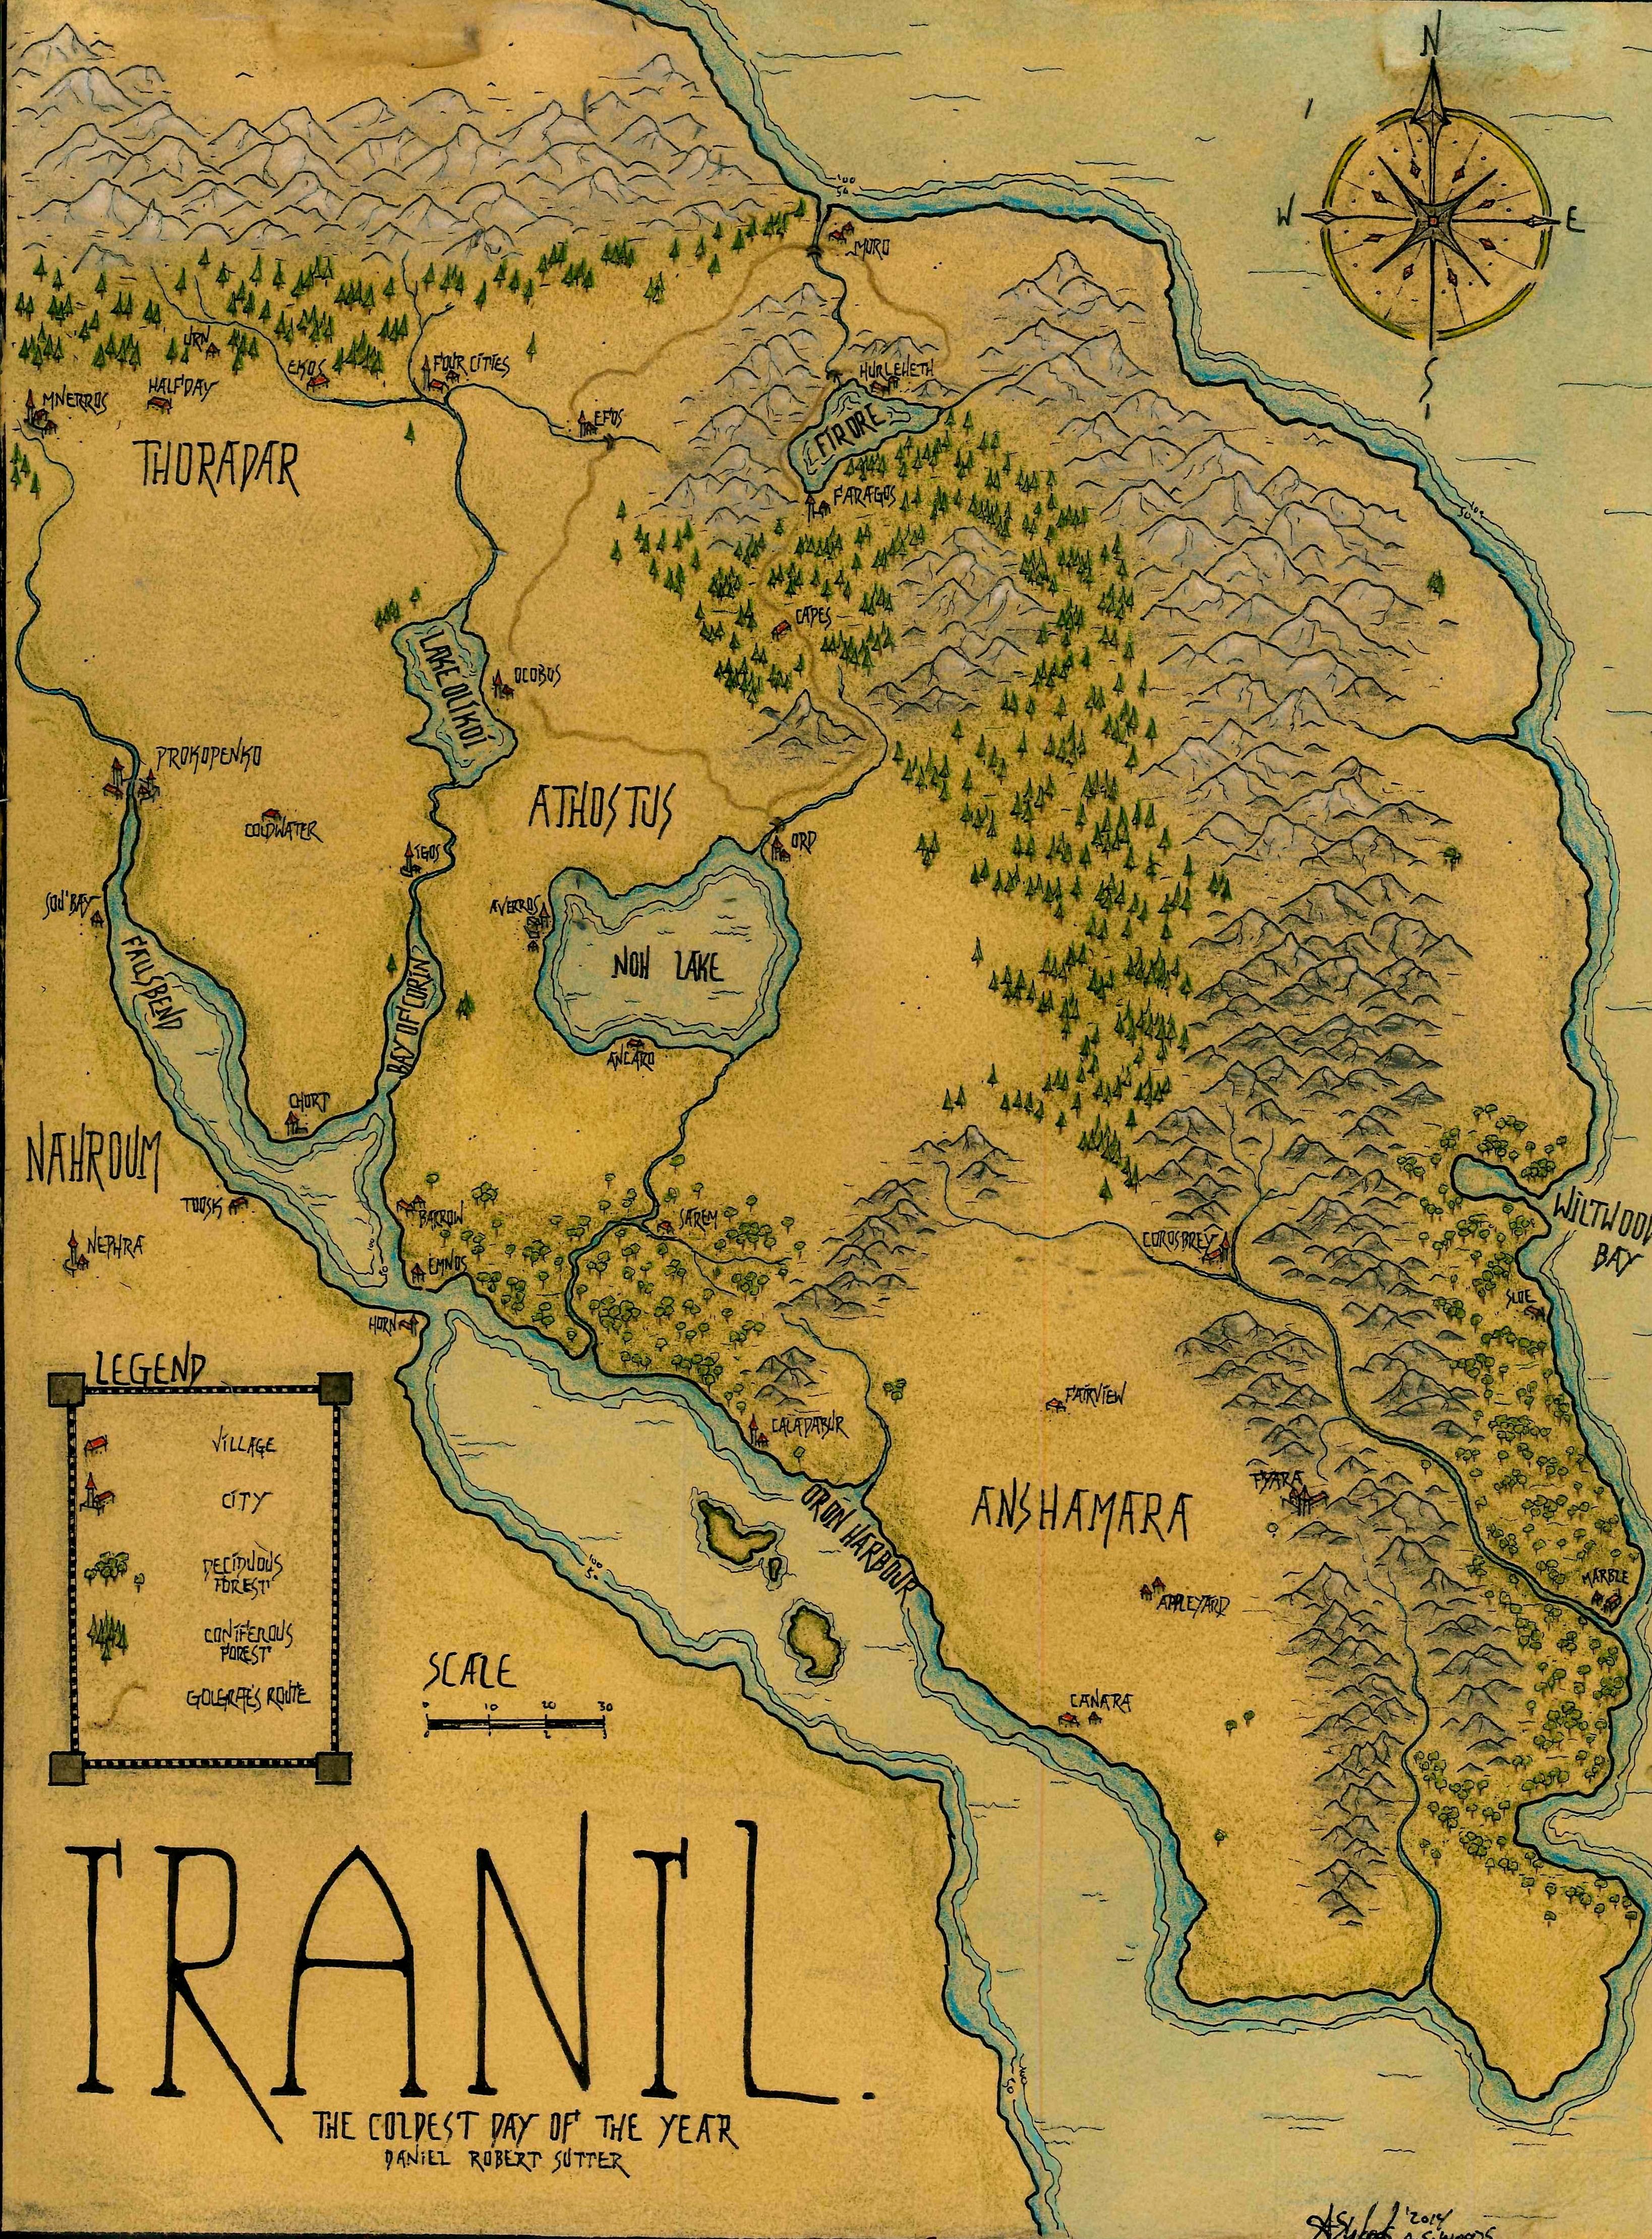 Iranil page 001